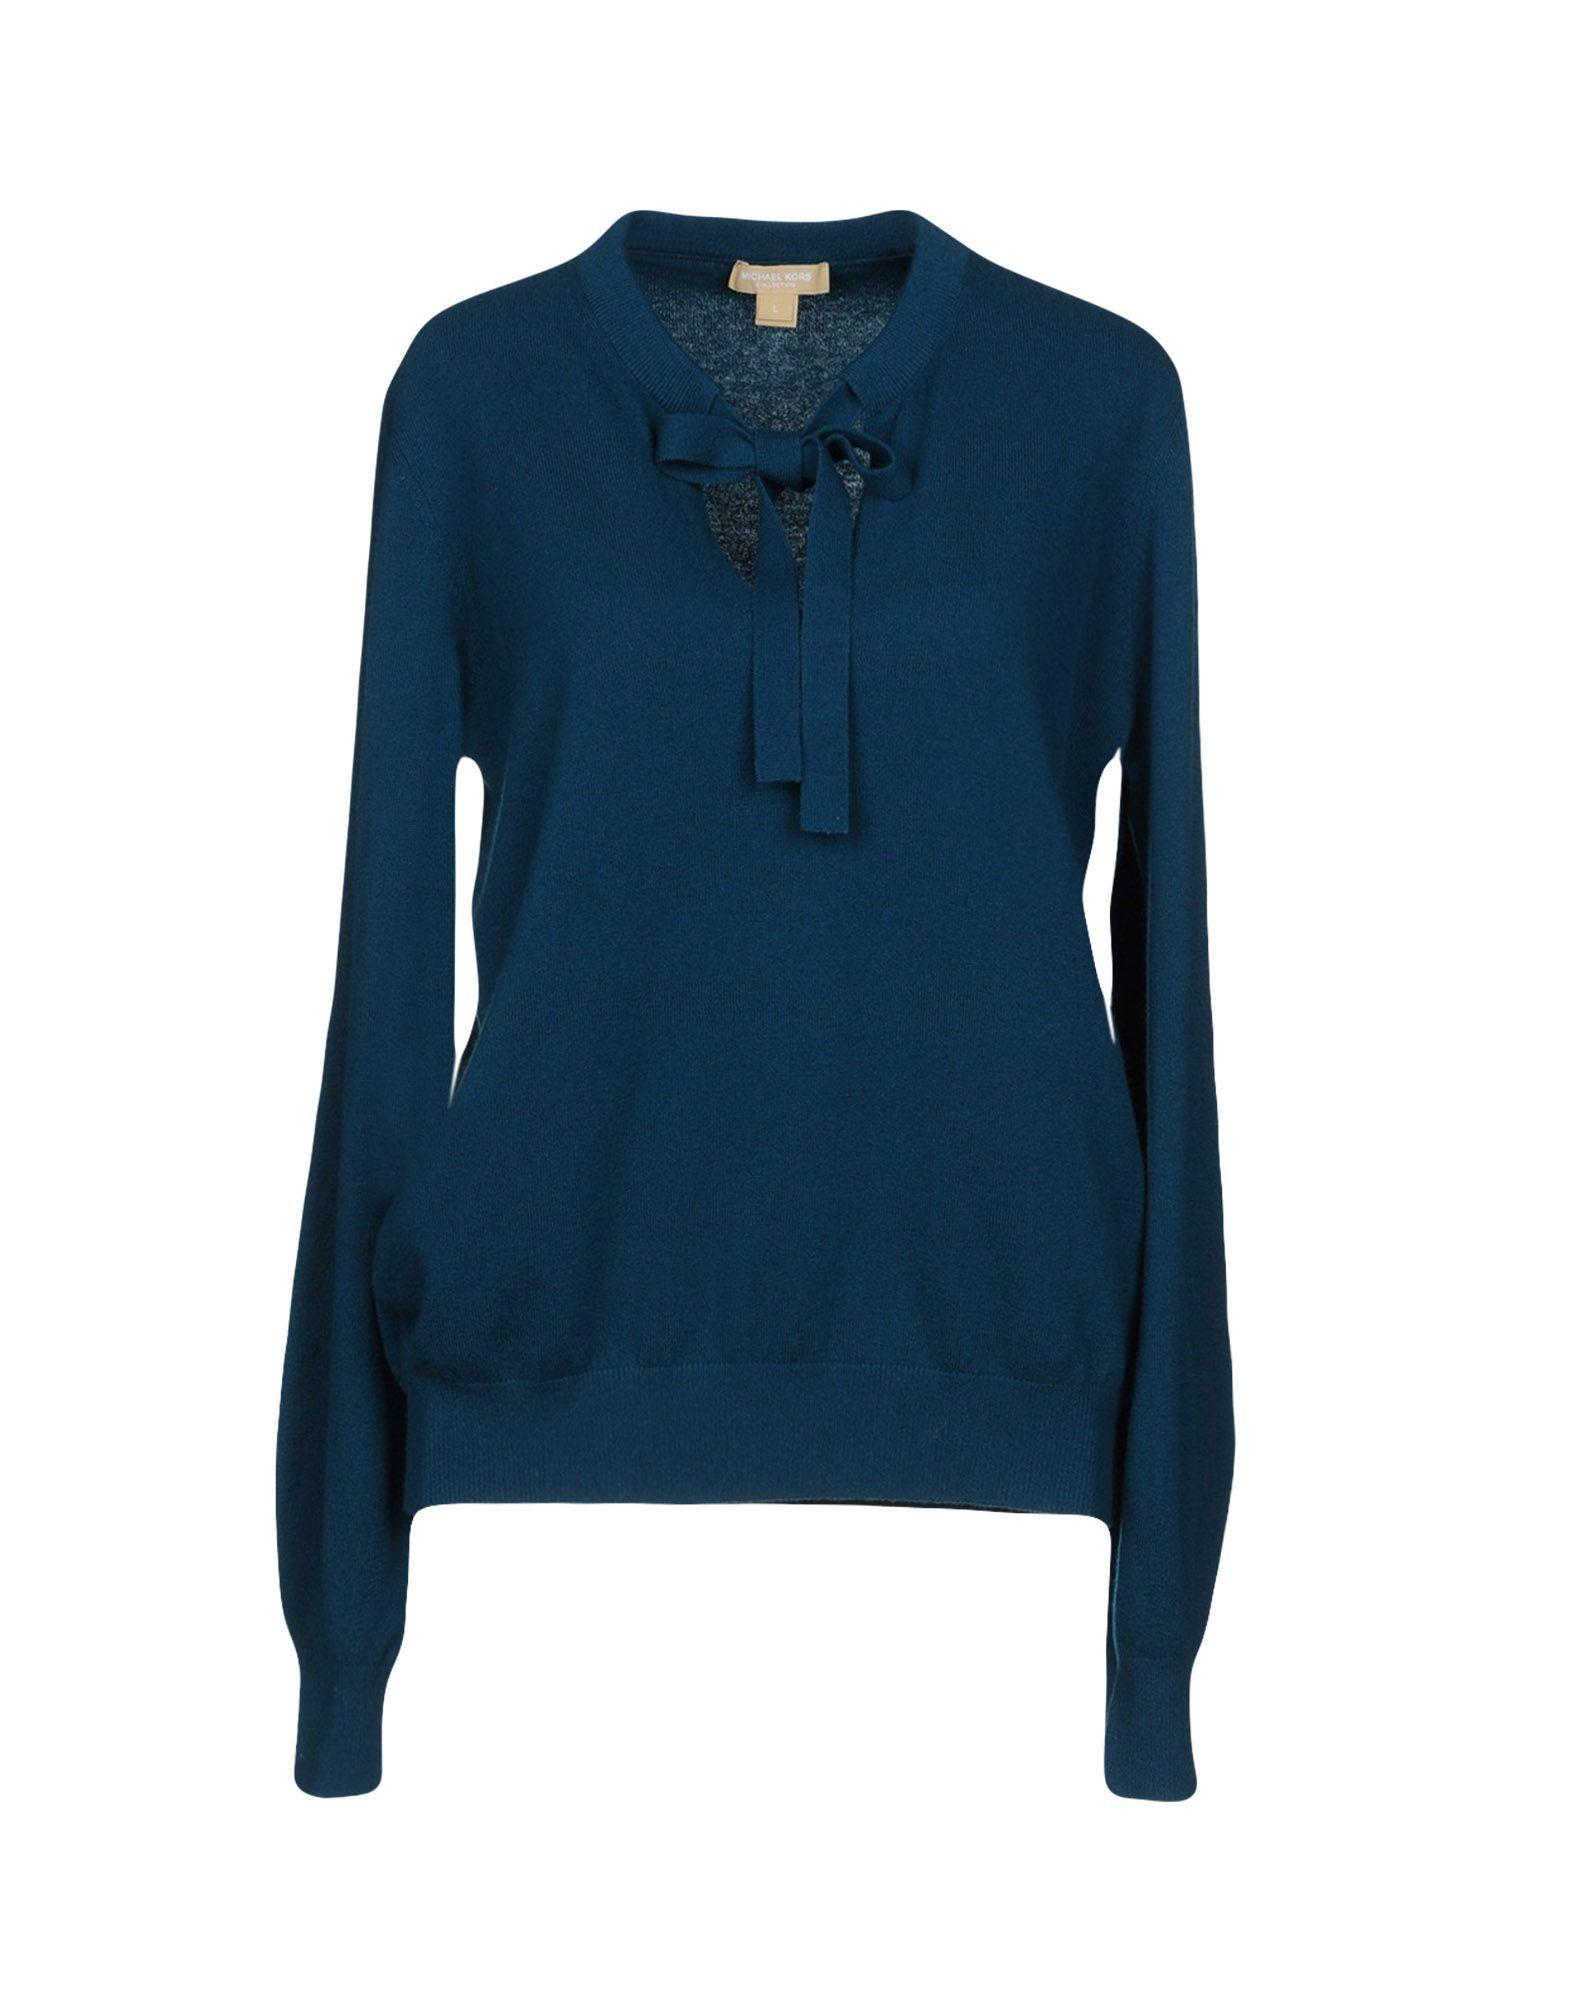 Michael Kors Sweater In Deep Jade